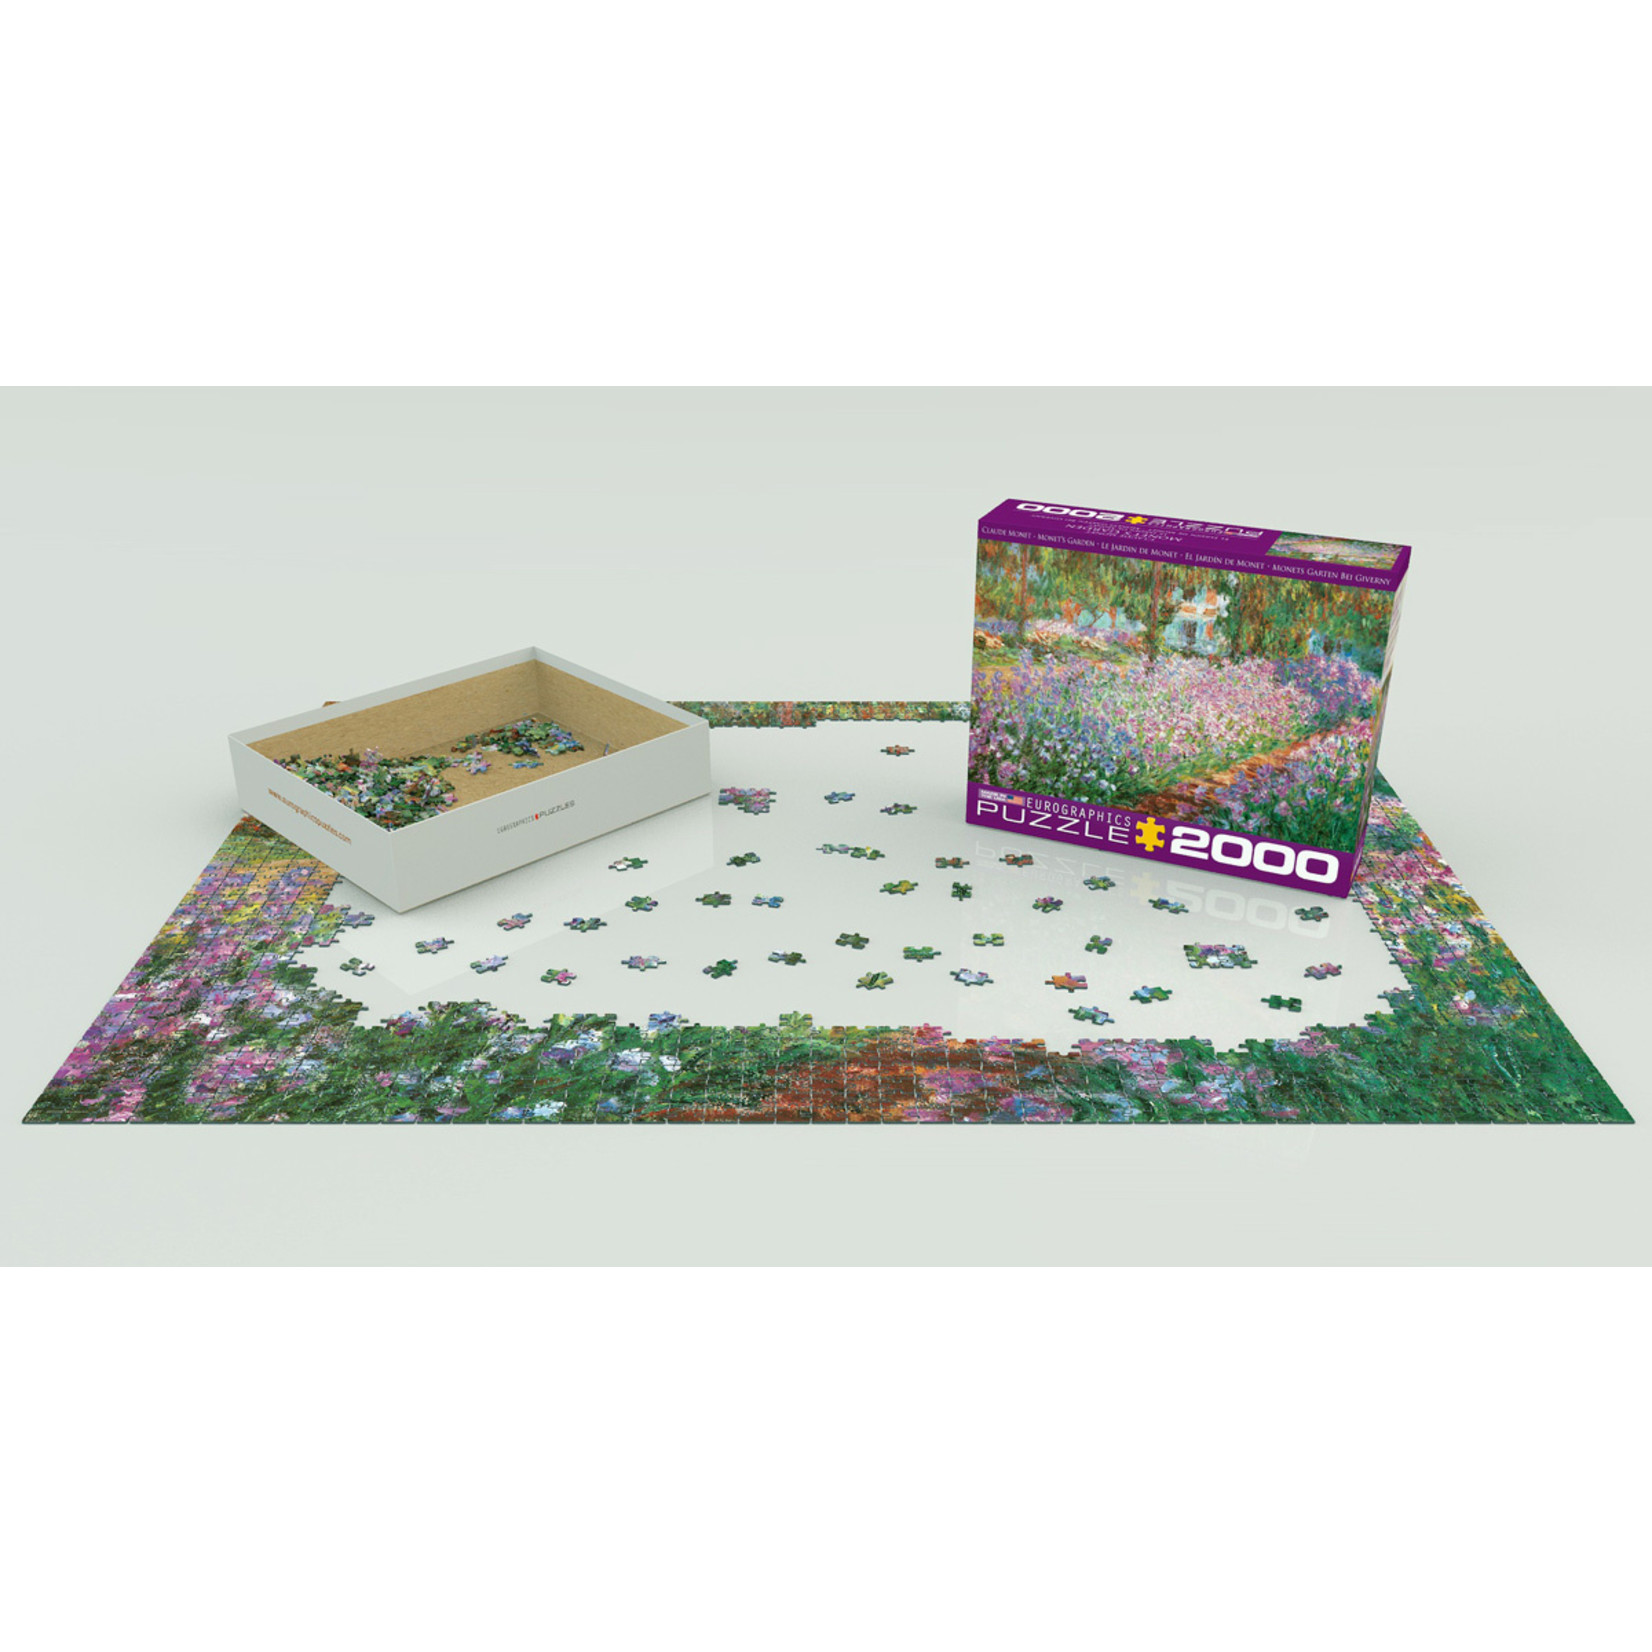 EuroGraphics Puzzles Monet's Garden 2000pc